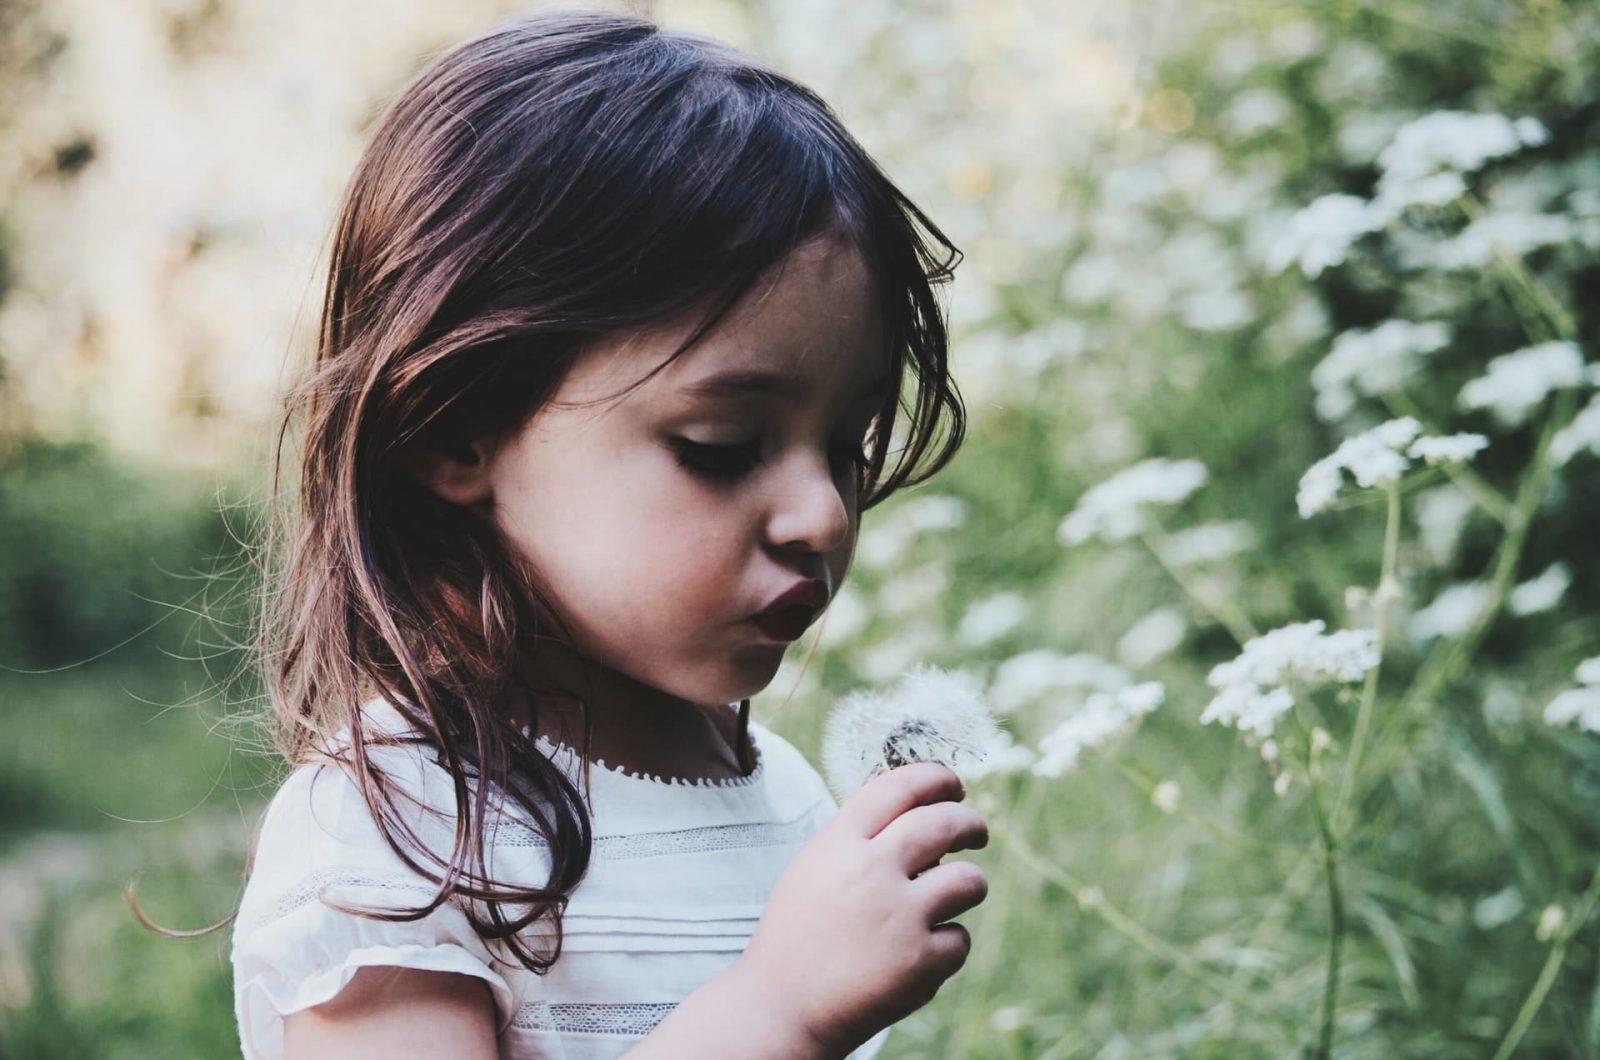 Allergies respiratoires chez l'enfant